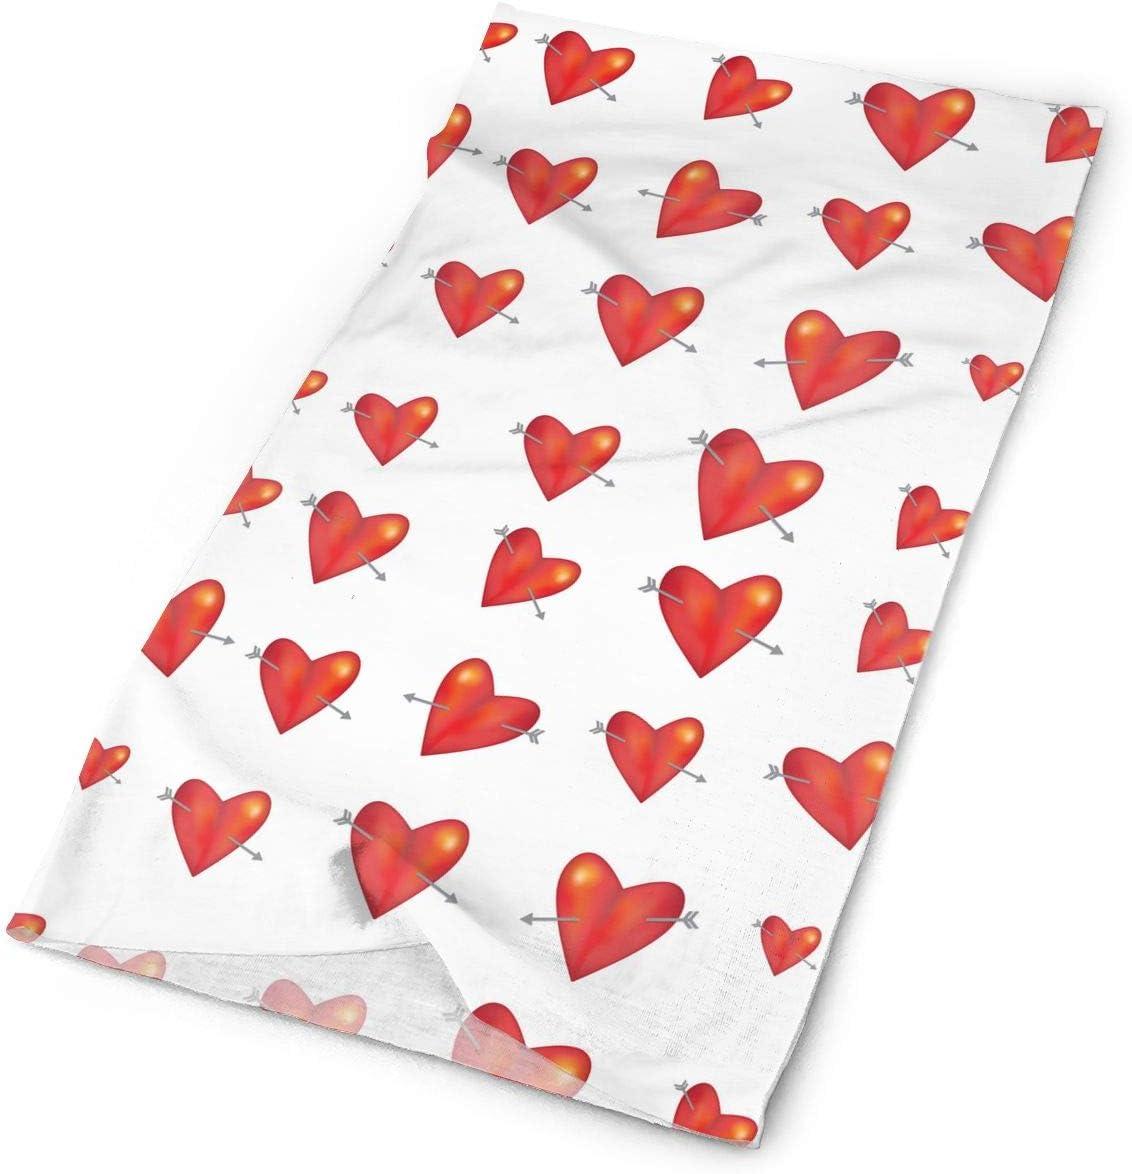 LCZ Magic Headwear Red Arrow Love Heart Candy Scarf Headbands Bandana Mask Neck Gaiter Head Wrap Mask Sweatband